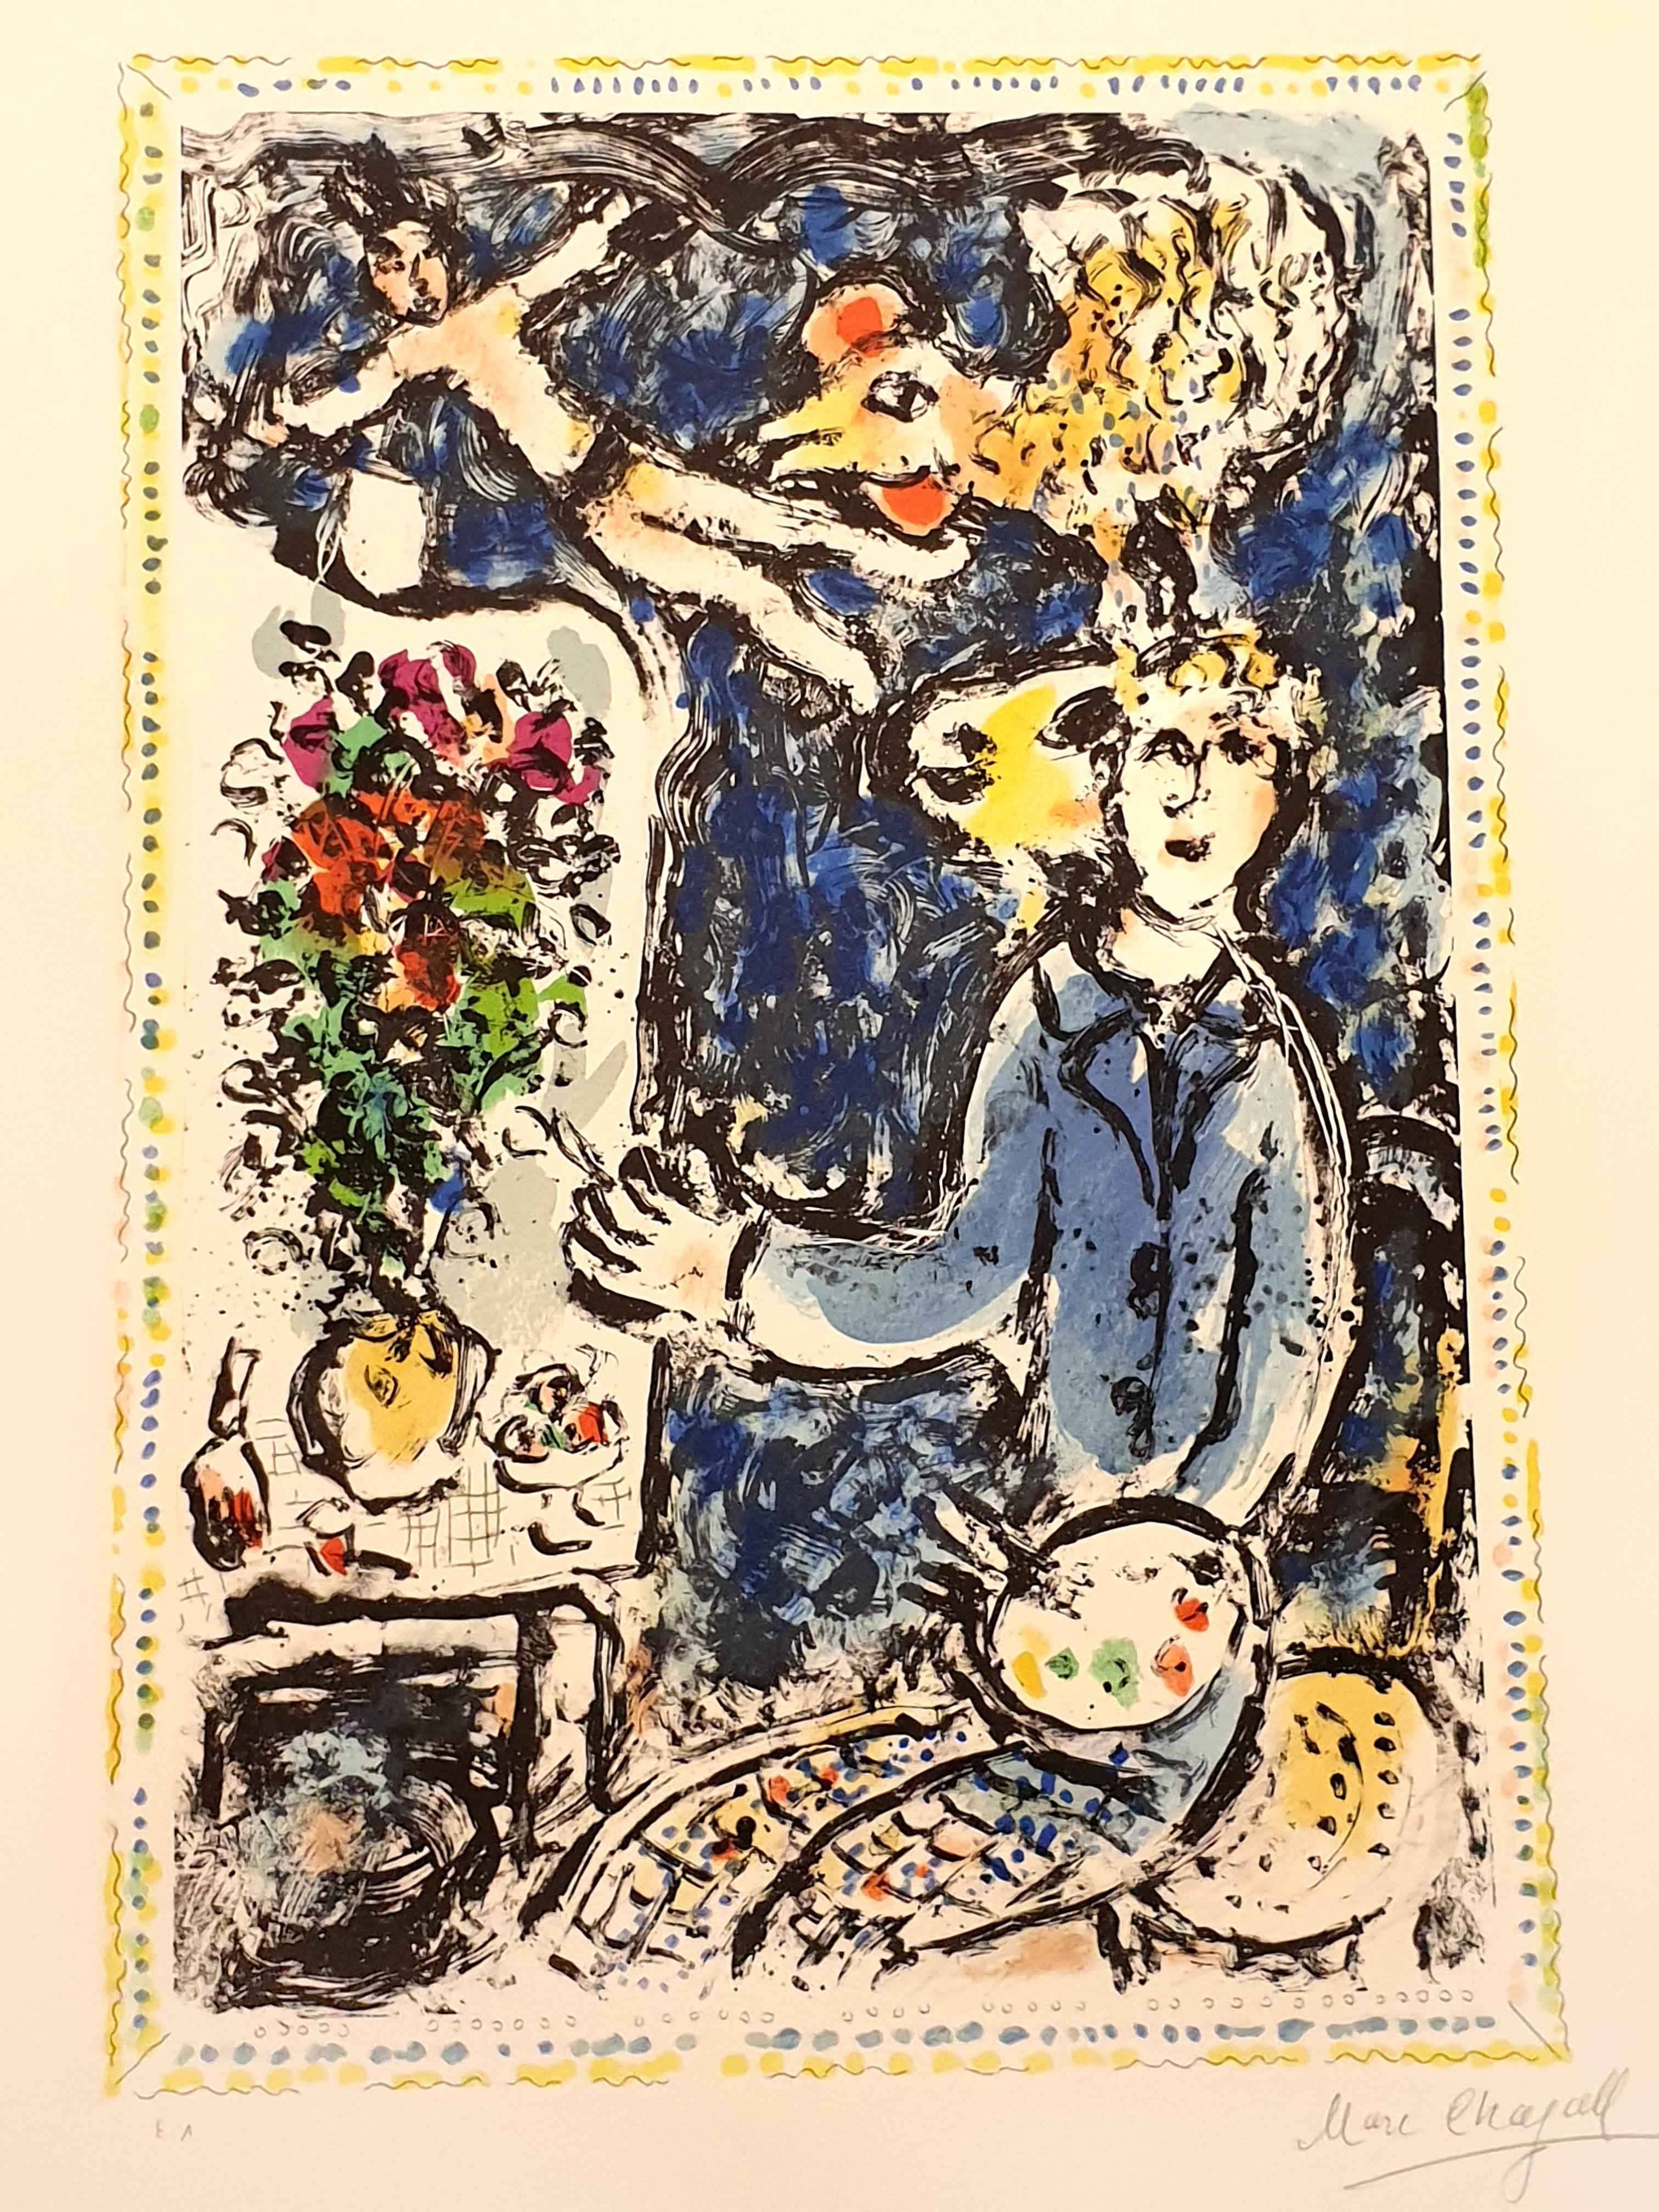 Marc Chagall - The Blue Workshop - Original Handsigned Lithograph